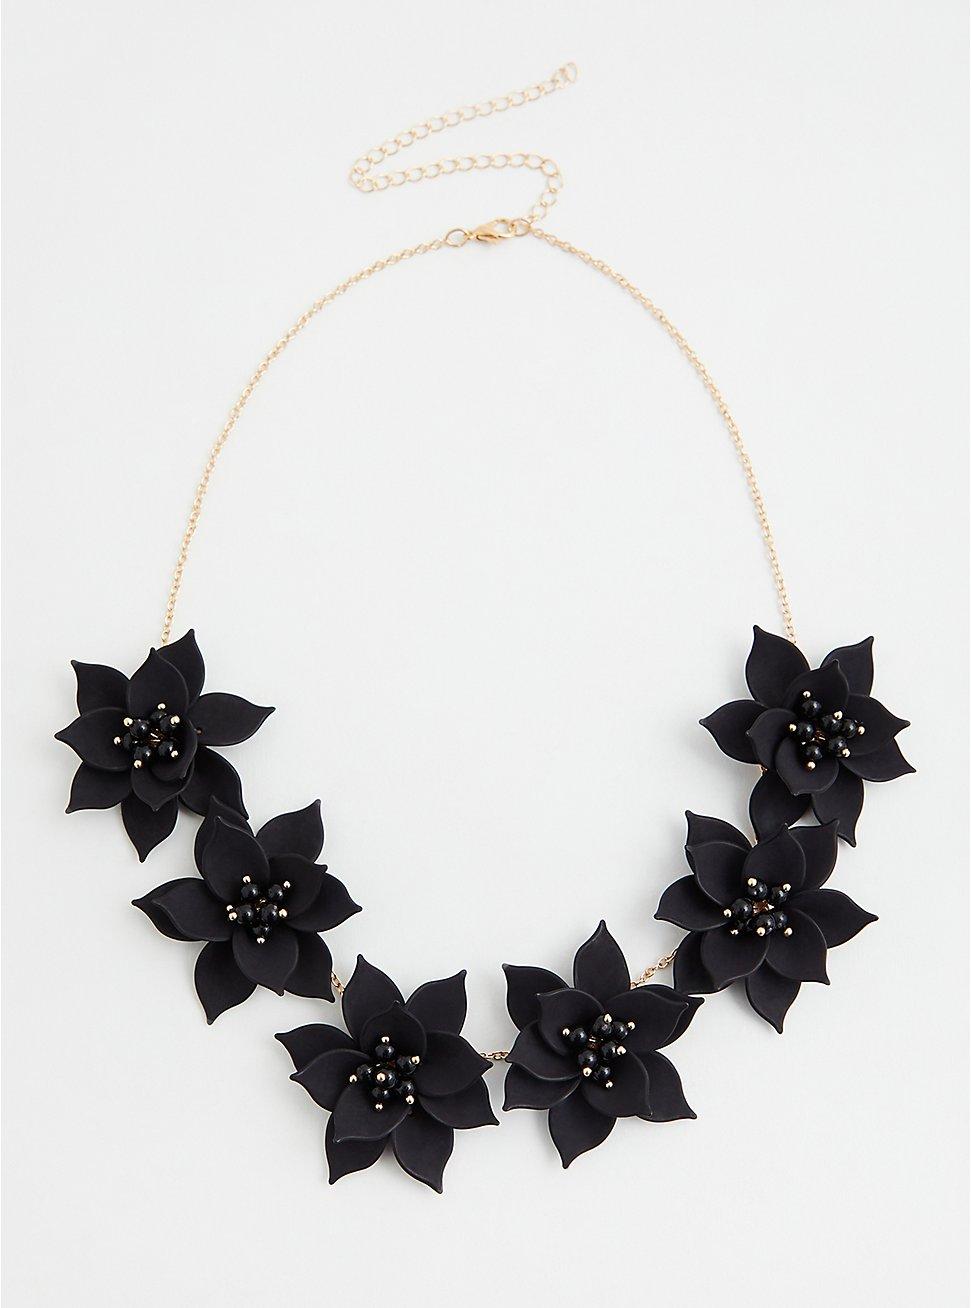 Gold-Tone & Black Floral Statement Necklace, , hi-res